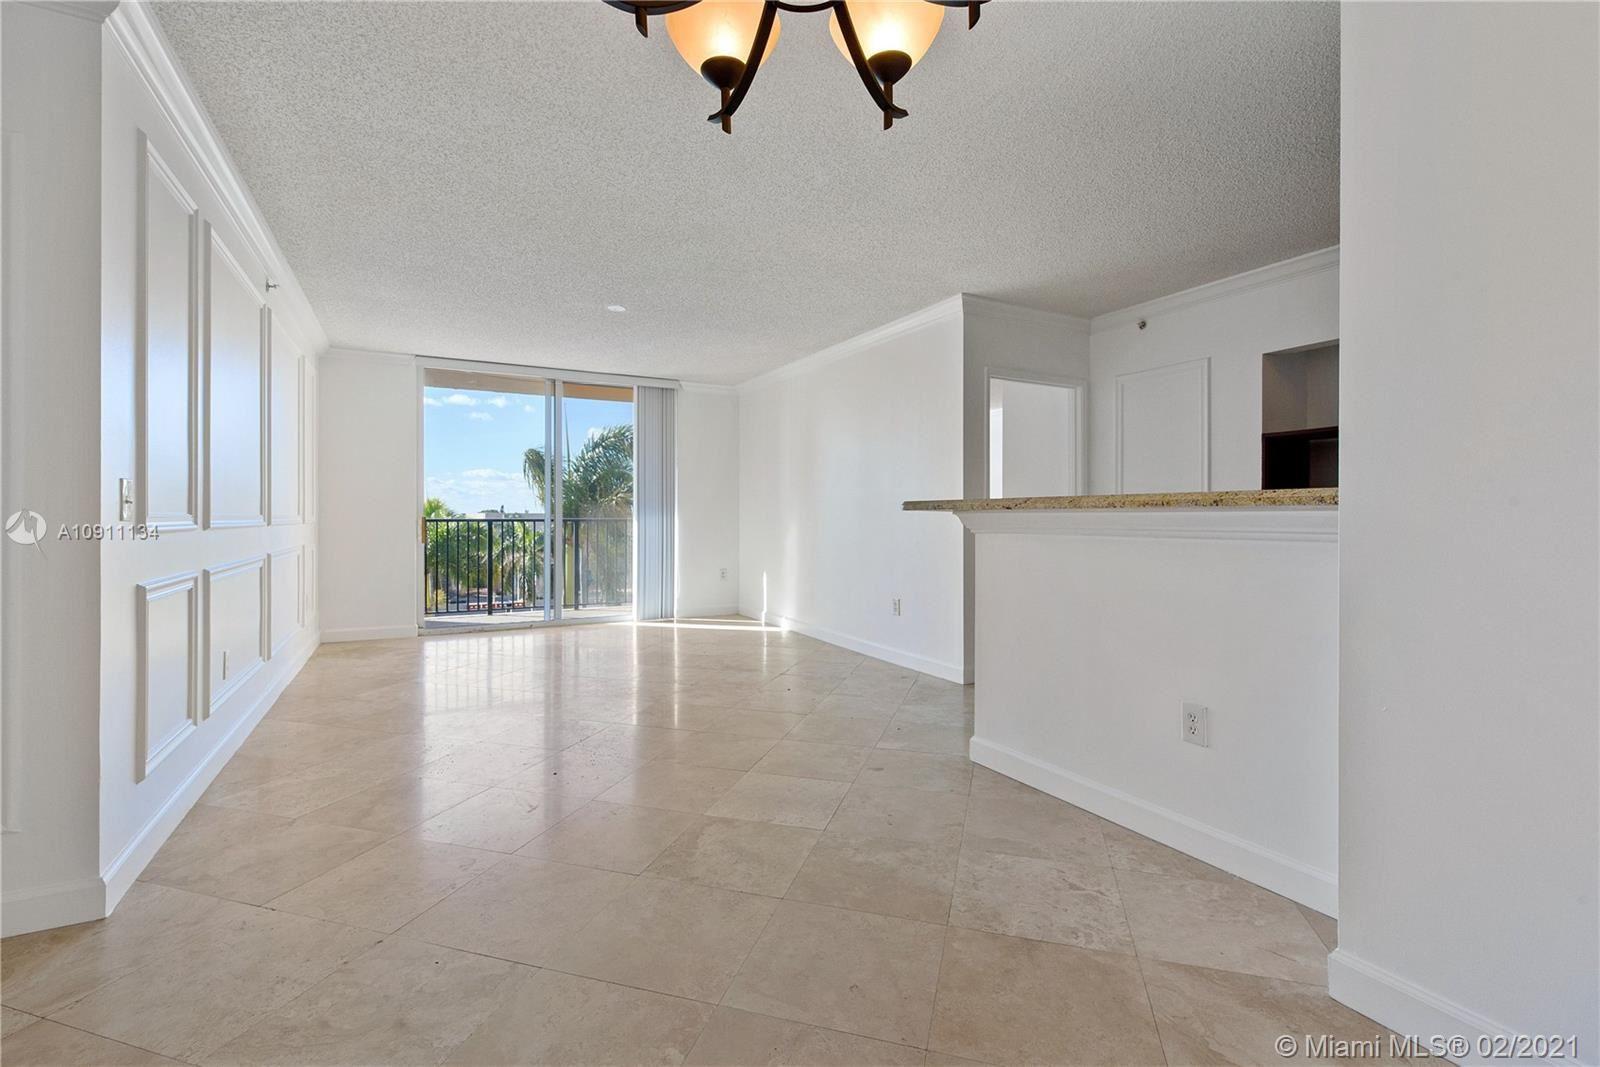 651 Okeechobee Blvd #409, West Palm Beach, FL 33401 - #: A10911134